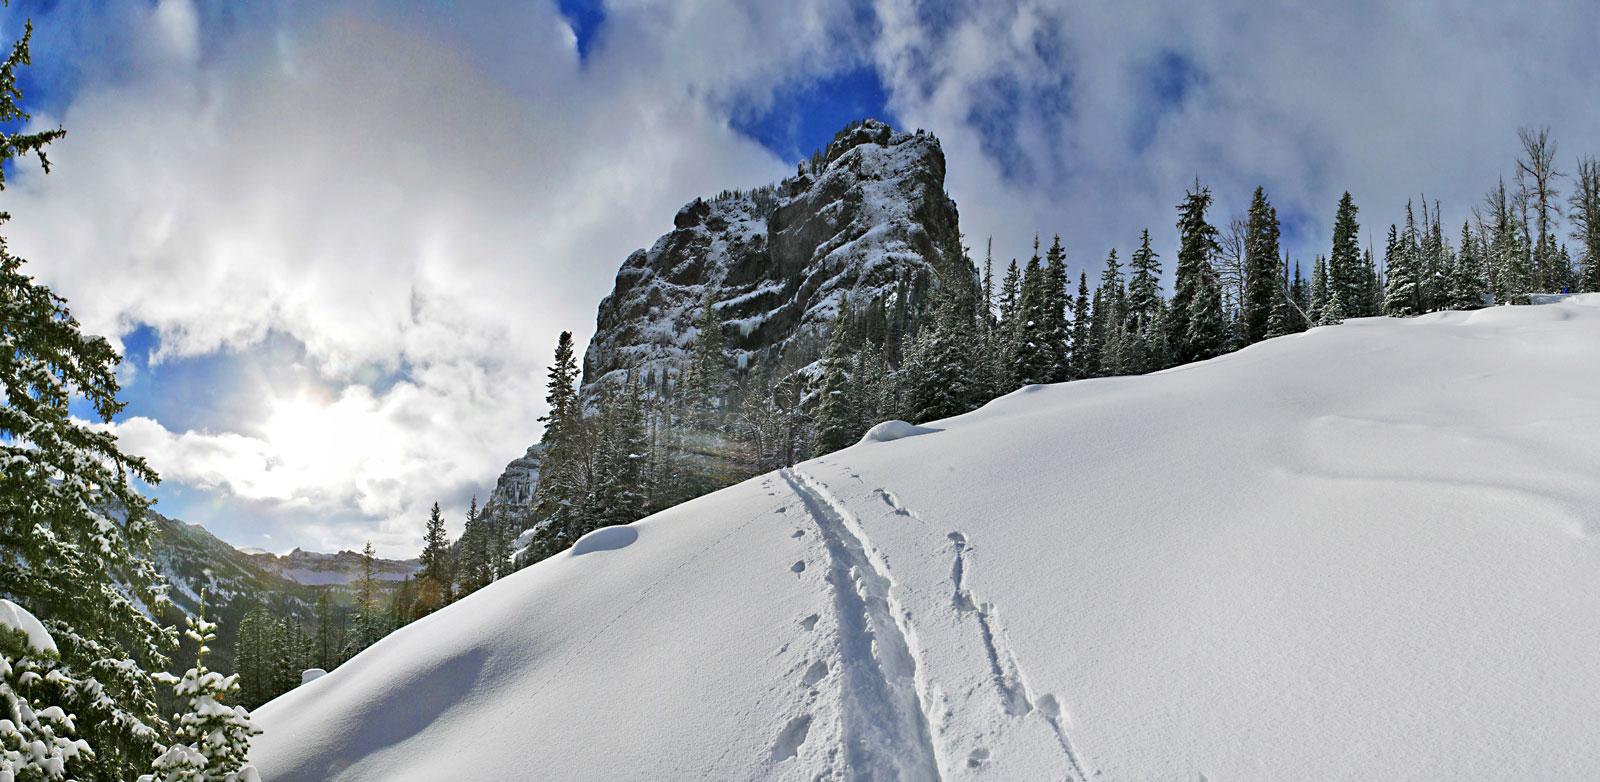 The Gallatin Range by Pat Clayton